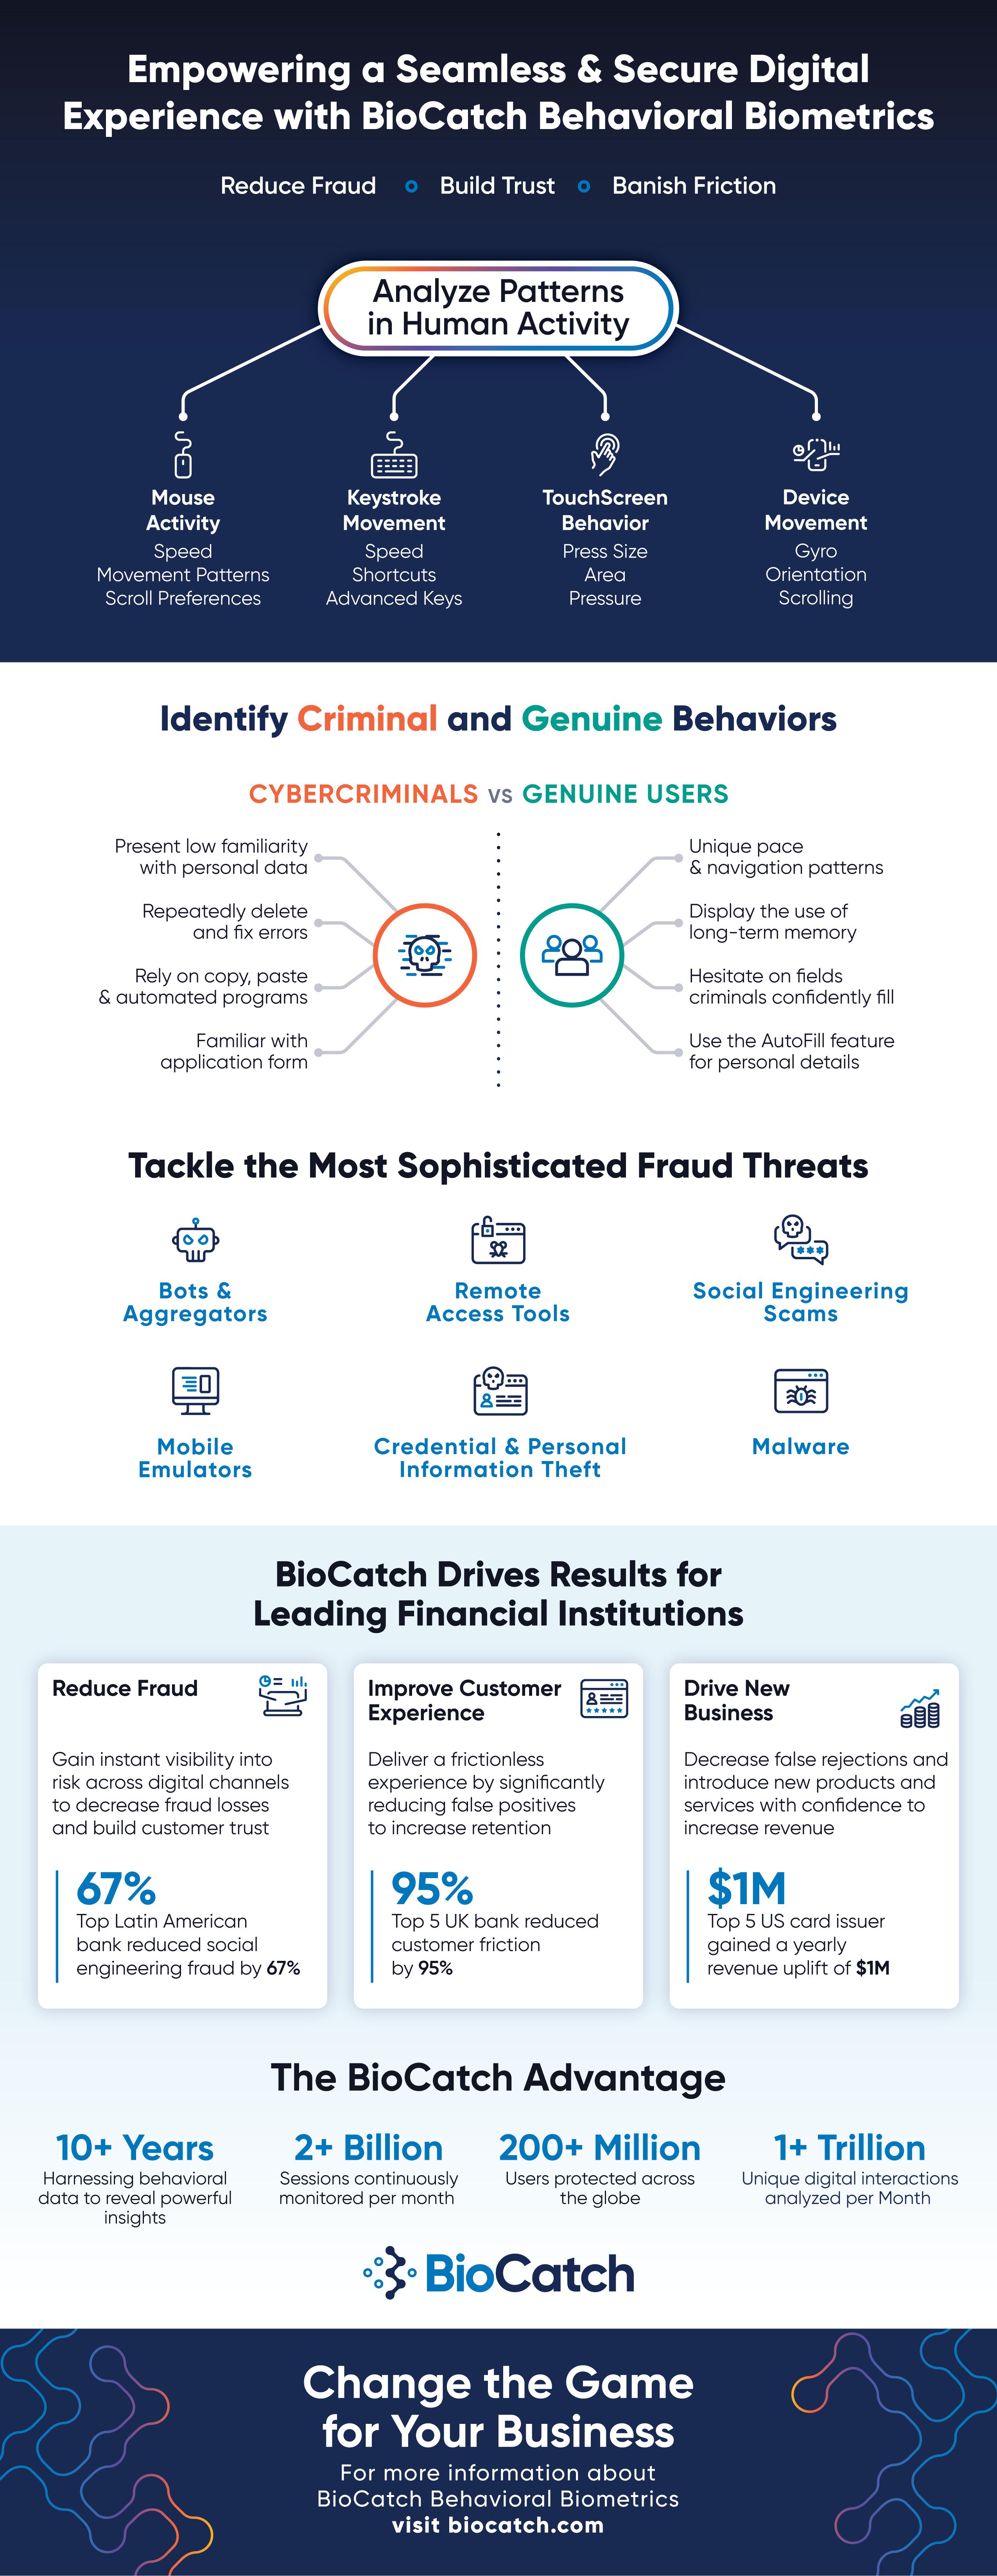 BioCatch-Behavioral-Biometrics-Infographic